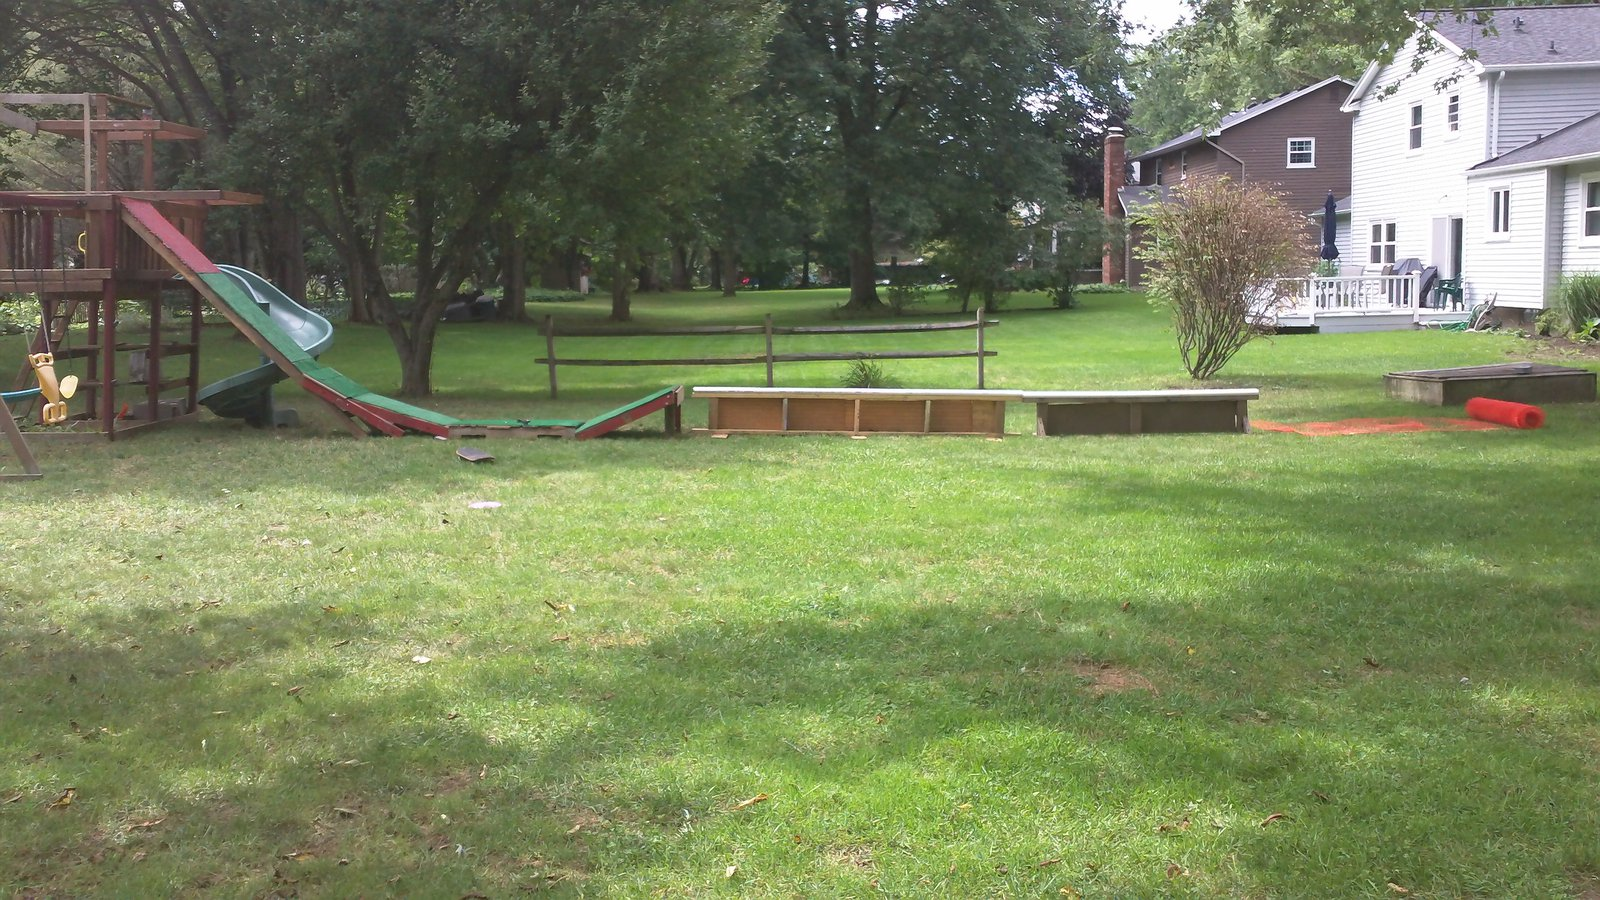 Summer setup side view